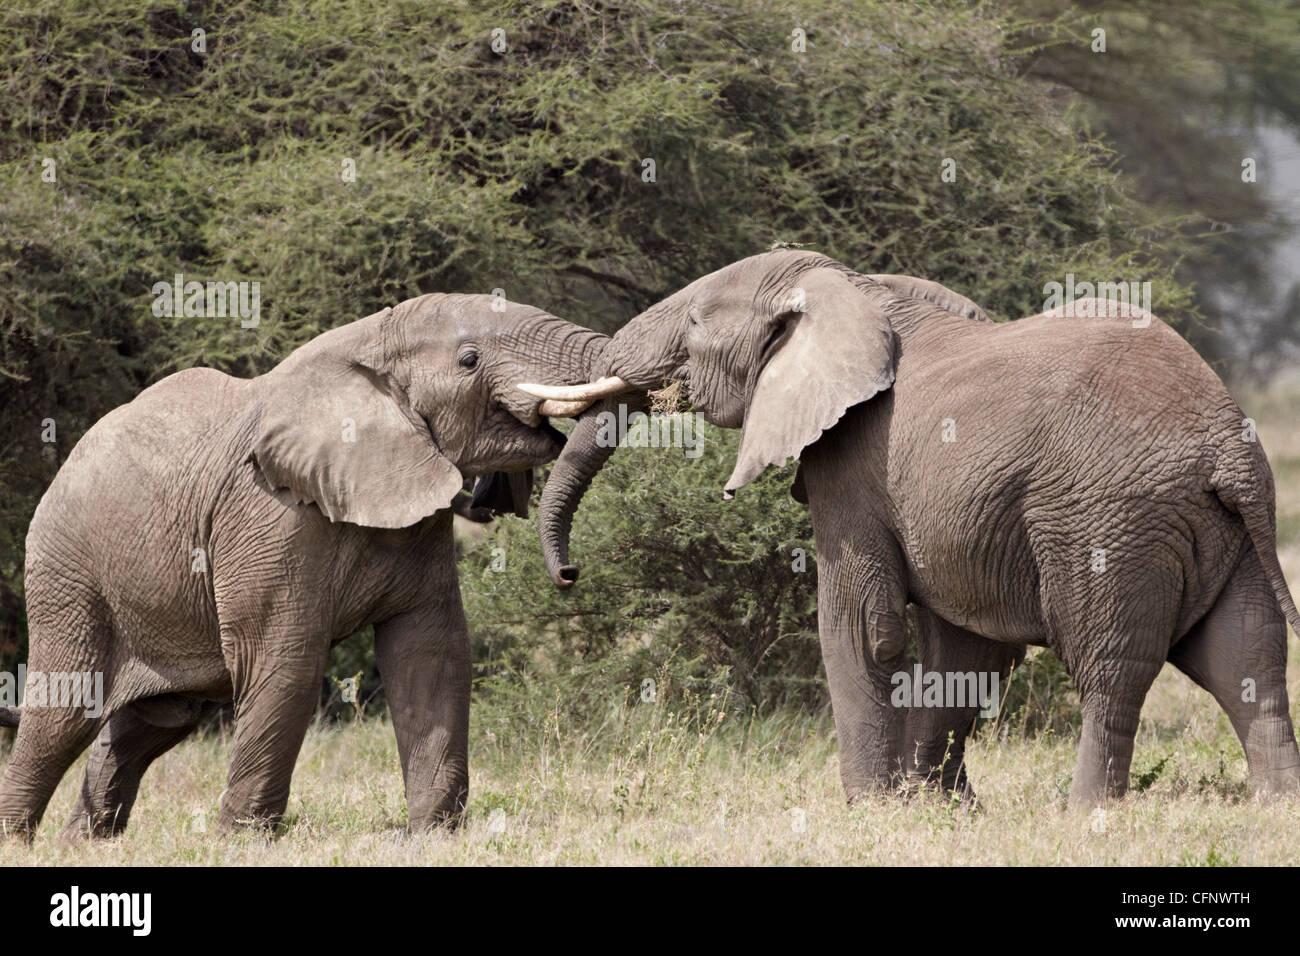 Deux African elephant (Loxodonta africana) sparring, Parc National de Serengeti, Tanzanie, Afrique orientale, Afrique Photo Stock